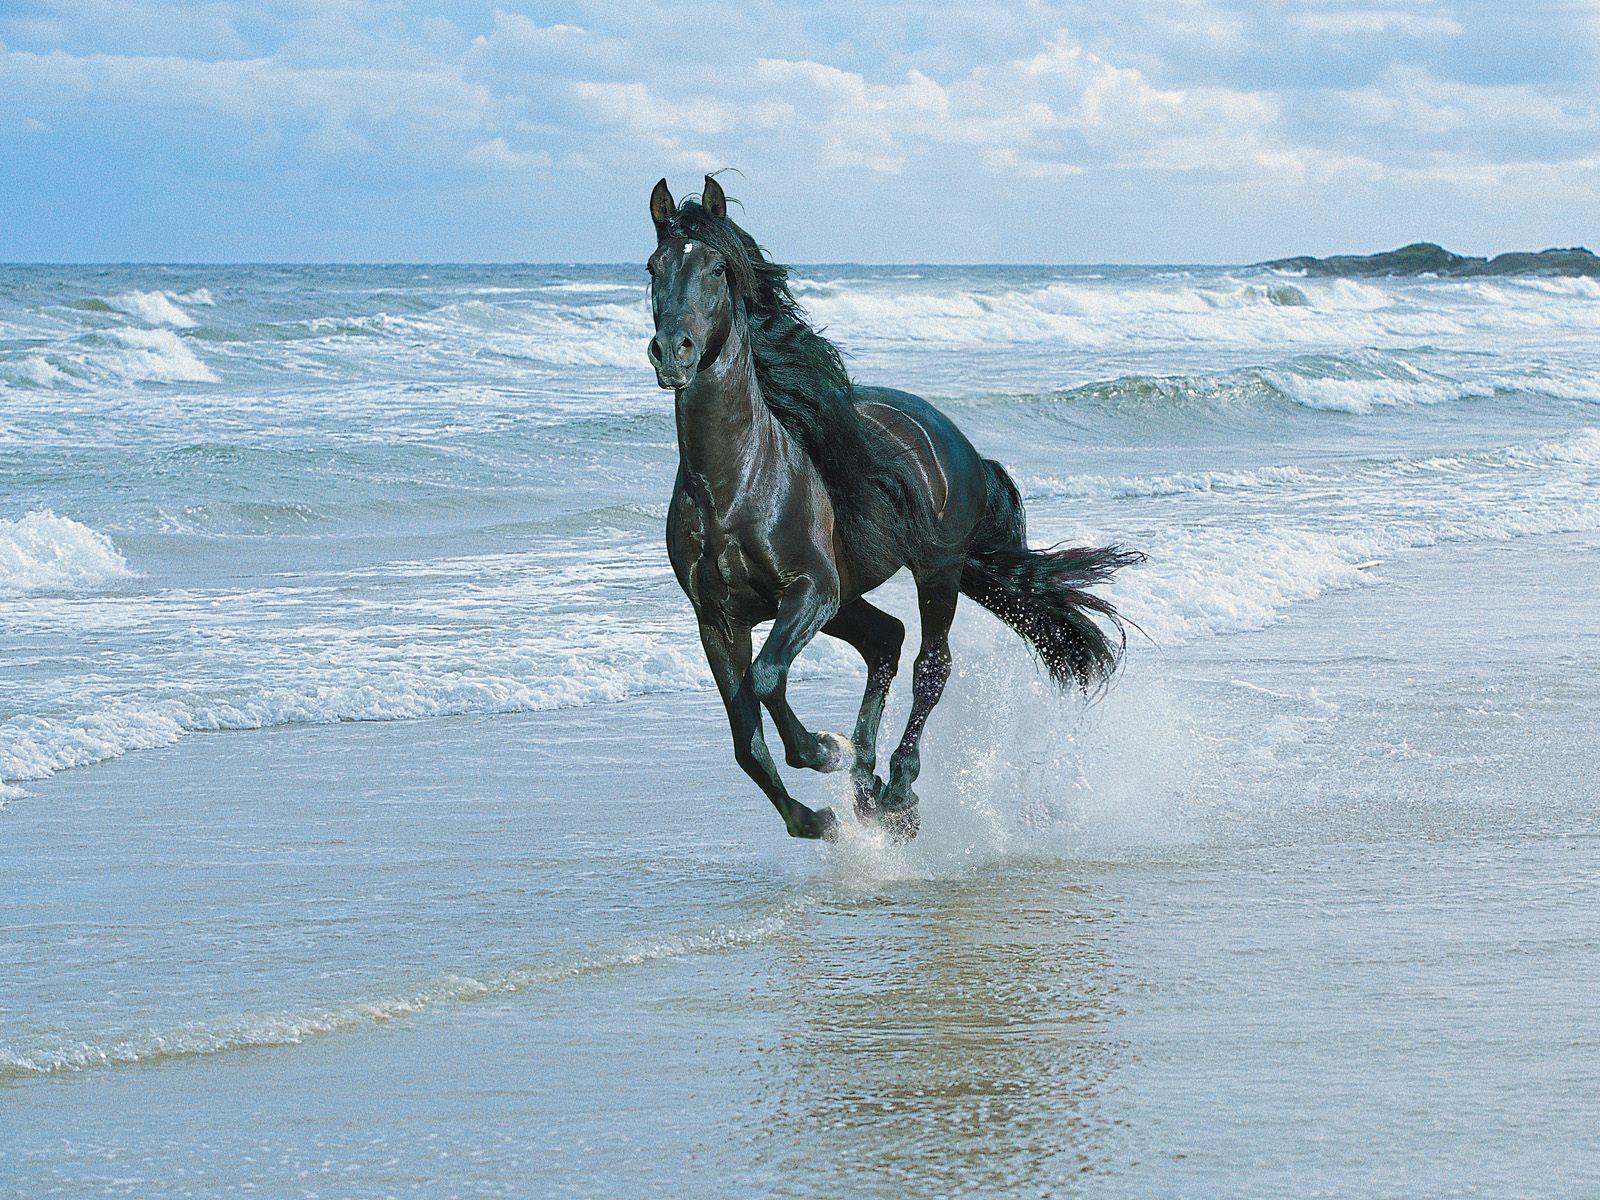 Amazing Black Horse Wallpaper Running Black Horse Hd 1600x1200 Wallpaper Teahub Io